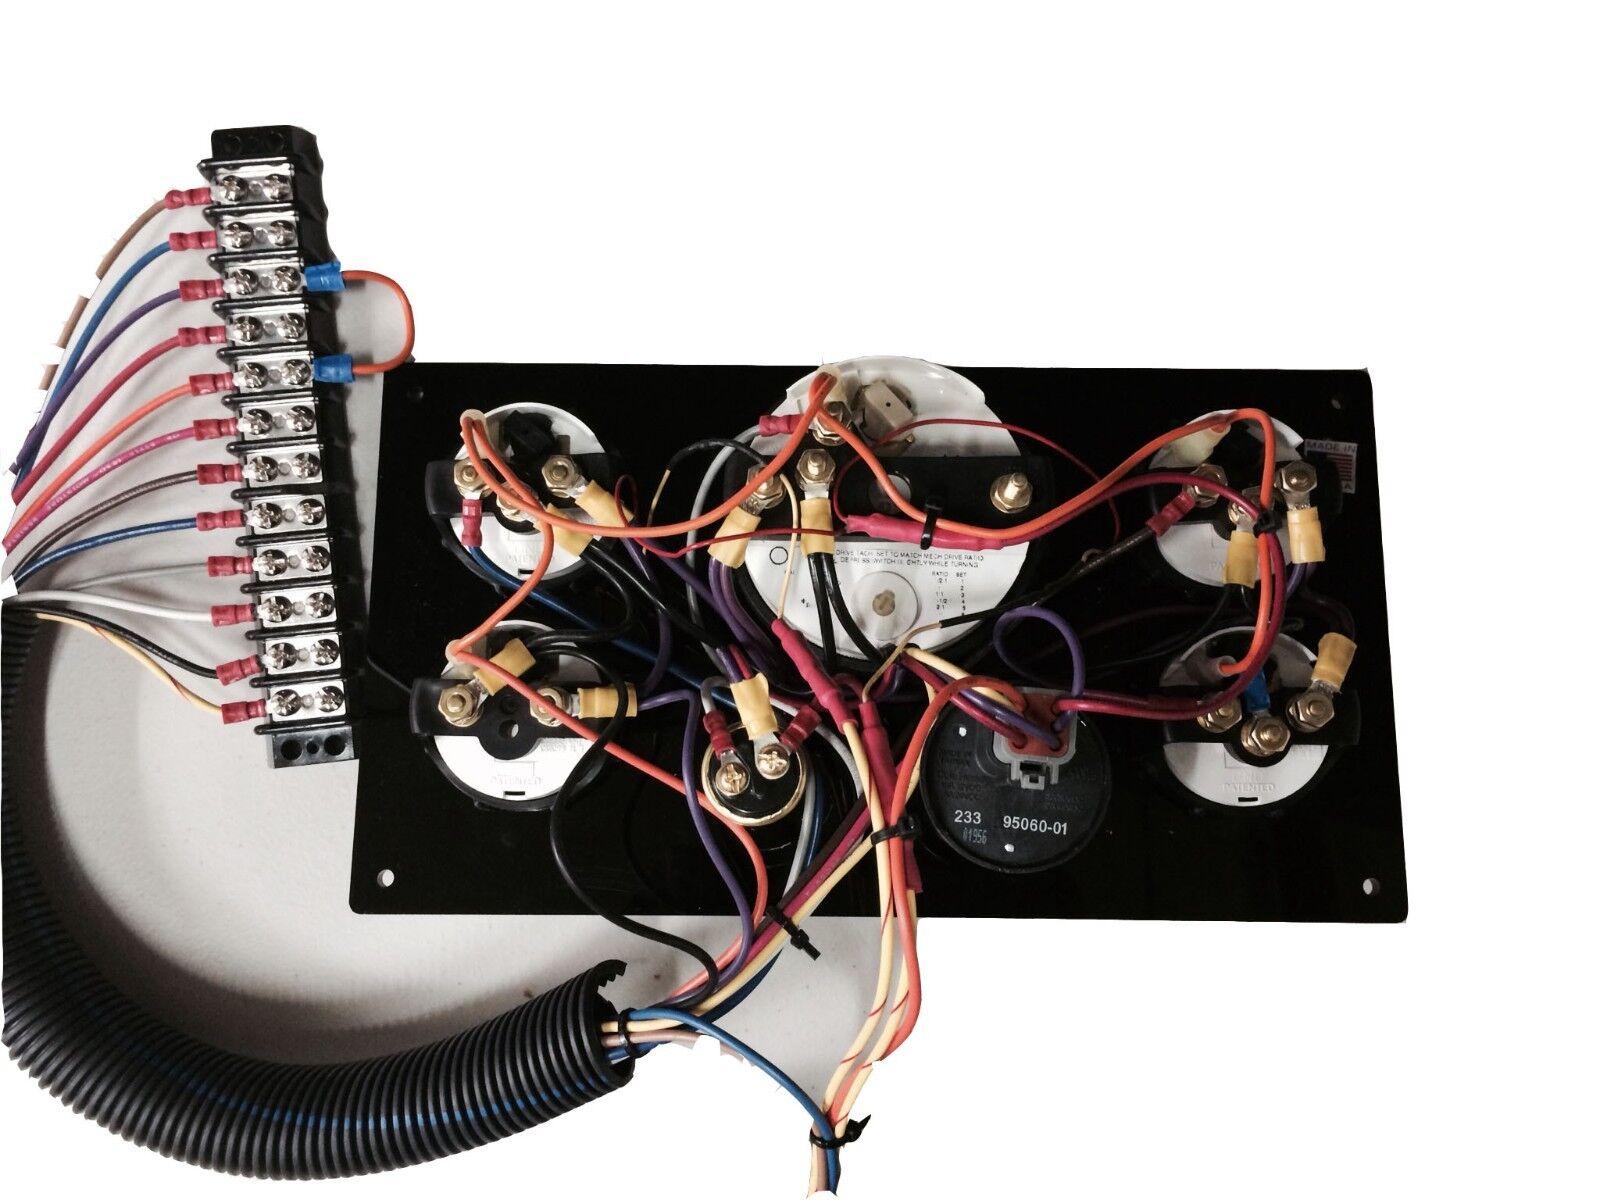 Caterpillar Engine Instrument Panel Marine Grade Wiring Harness 7 4 Norton Secured Powered By Verisign